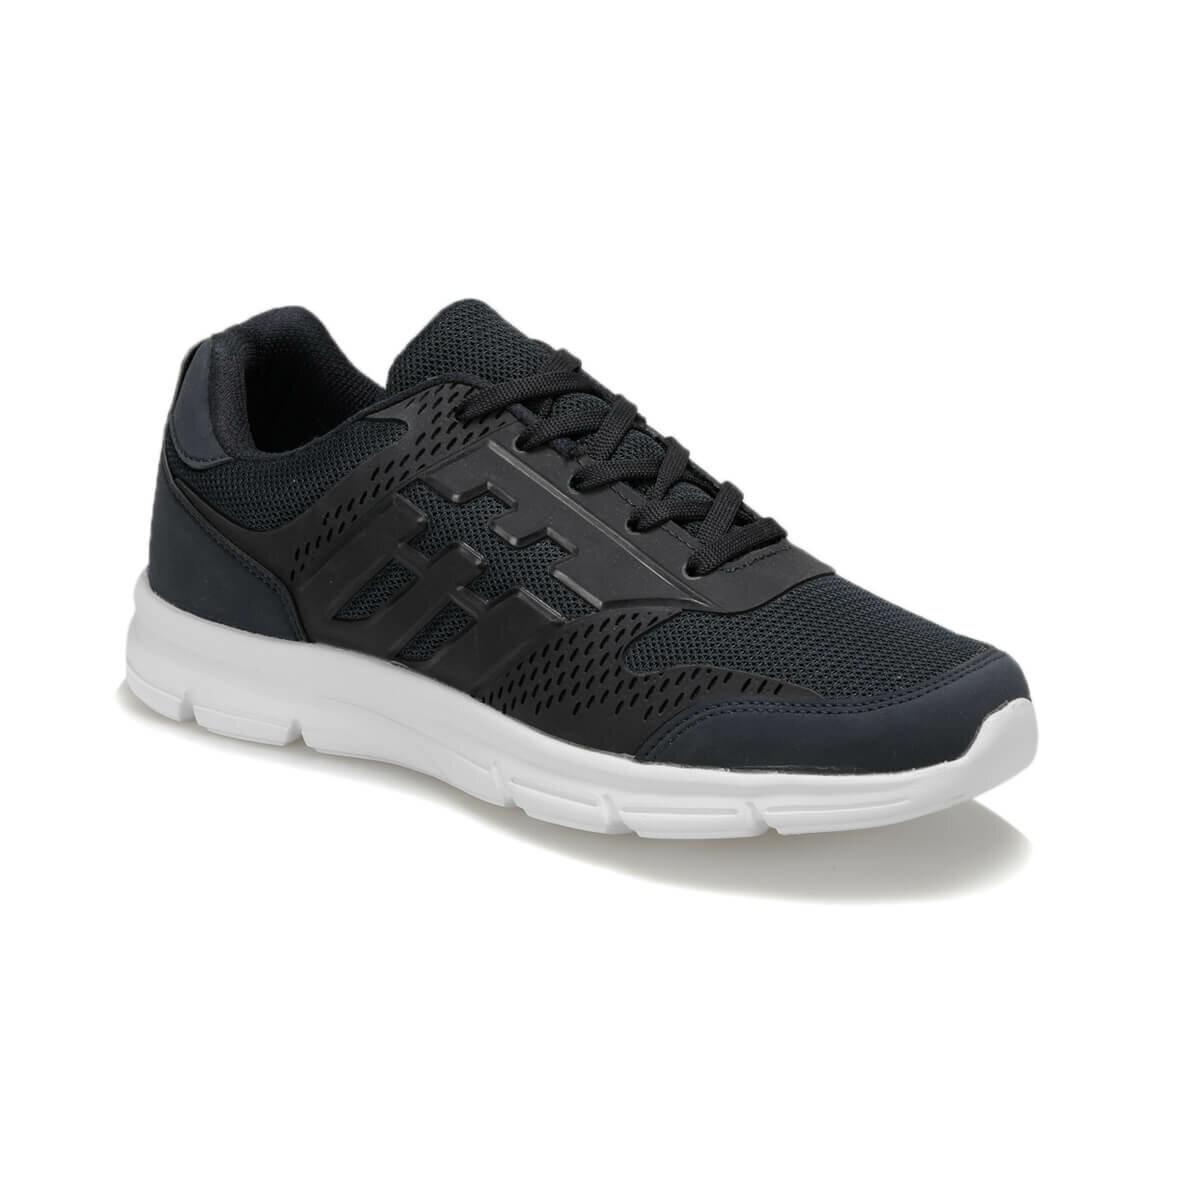 FLO Navy Blue Men Sneakers Sports Shoes Men Casual Shoes Lac-up Men Shoes Lightweight Comfortable Breathable Walking Sneakers Tenis Masculino Zapatillas Hombre Polaris 91. 356071.M